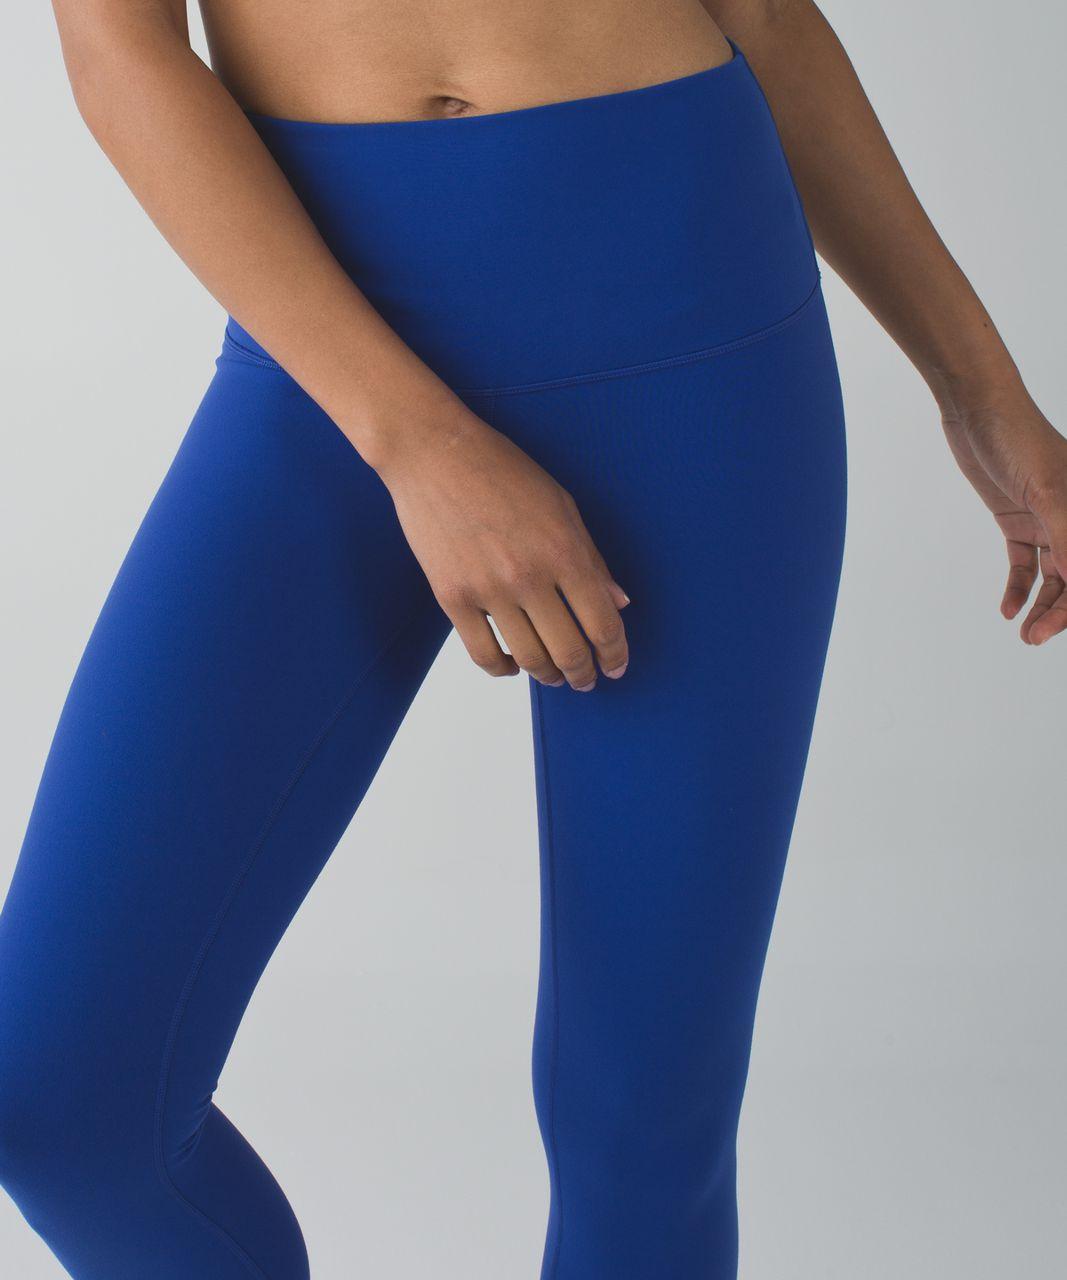 Lululemon Wunder Under Pant (Hi-Rise) *Full-On Luon - Sapphire Blue